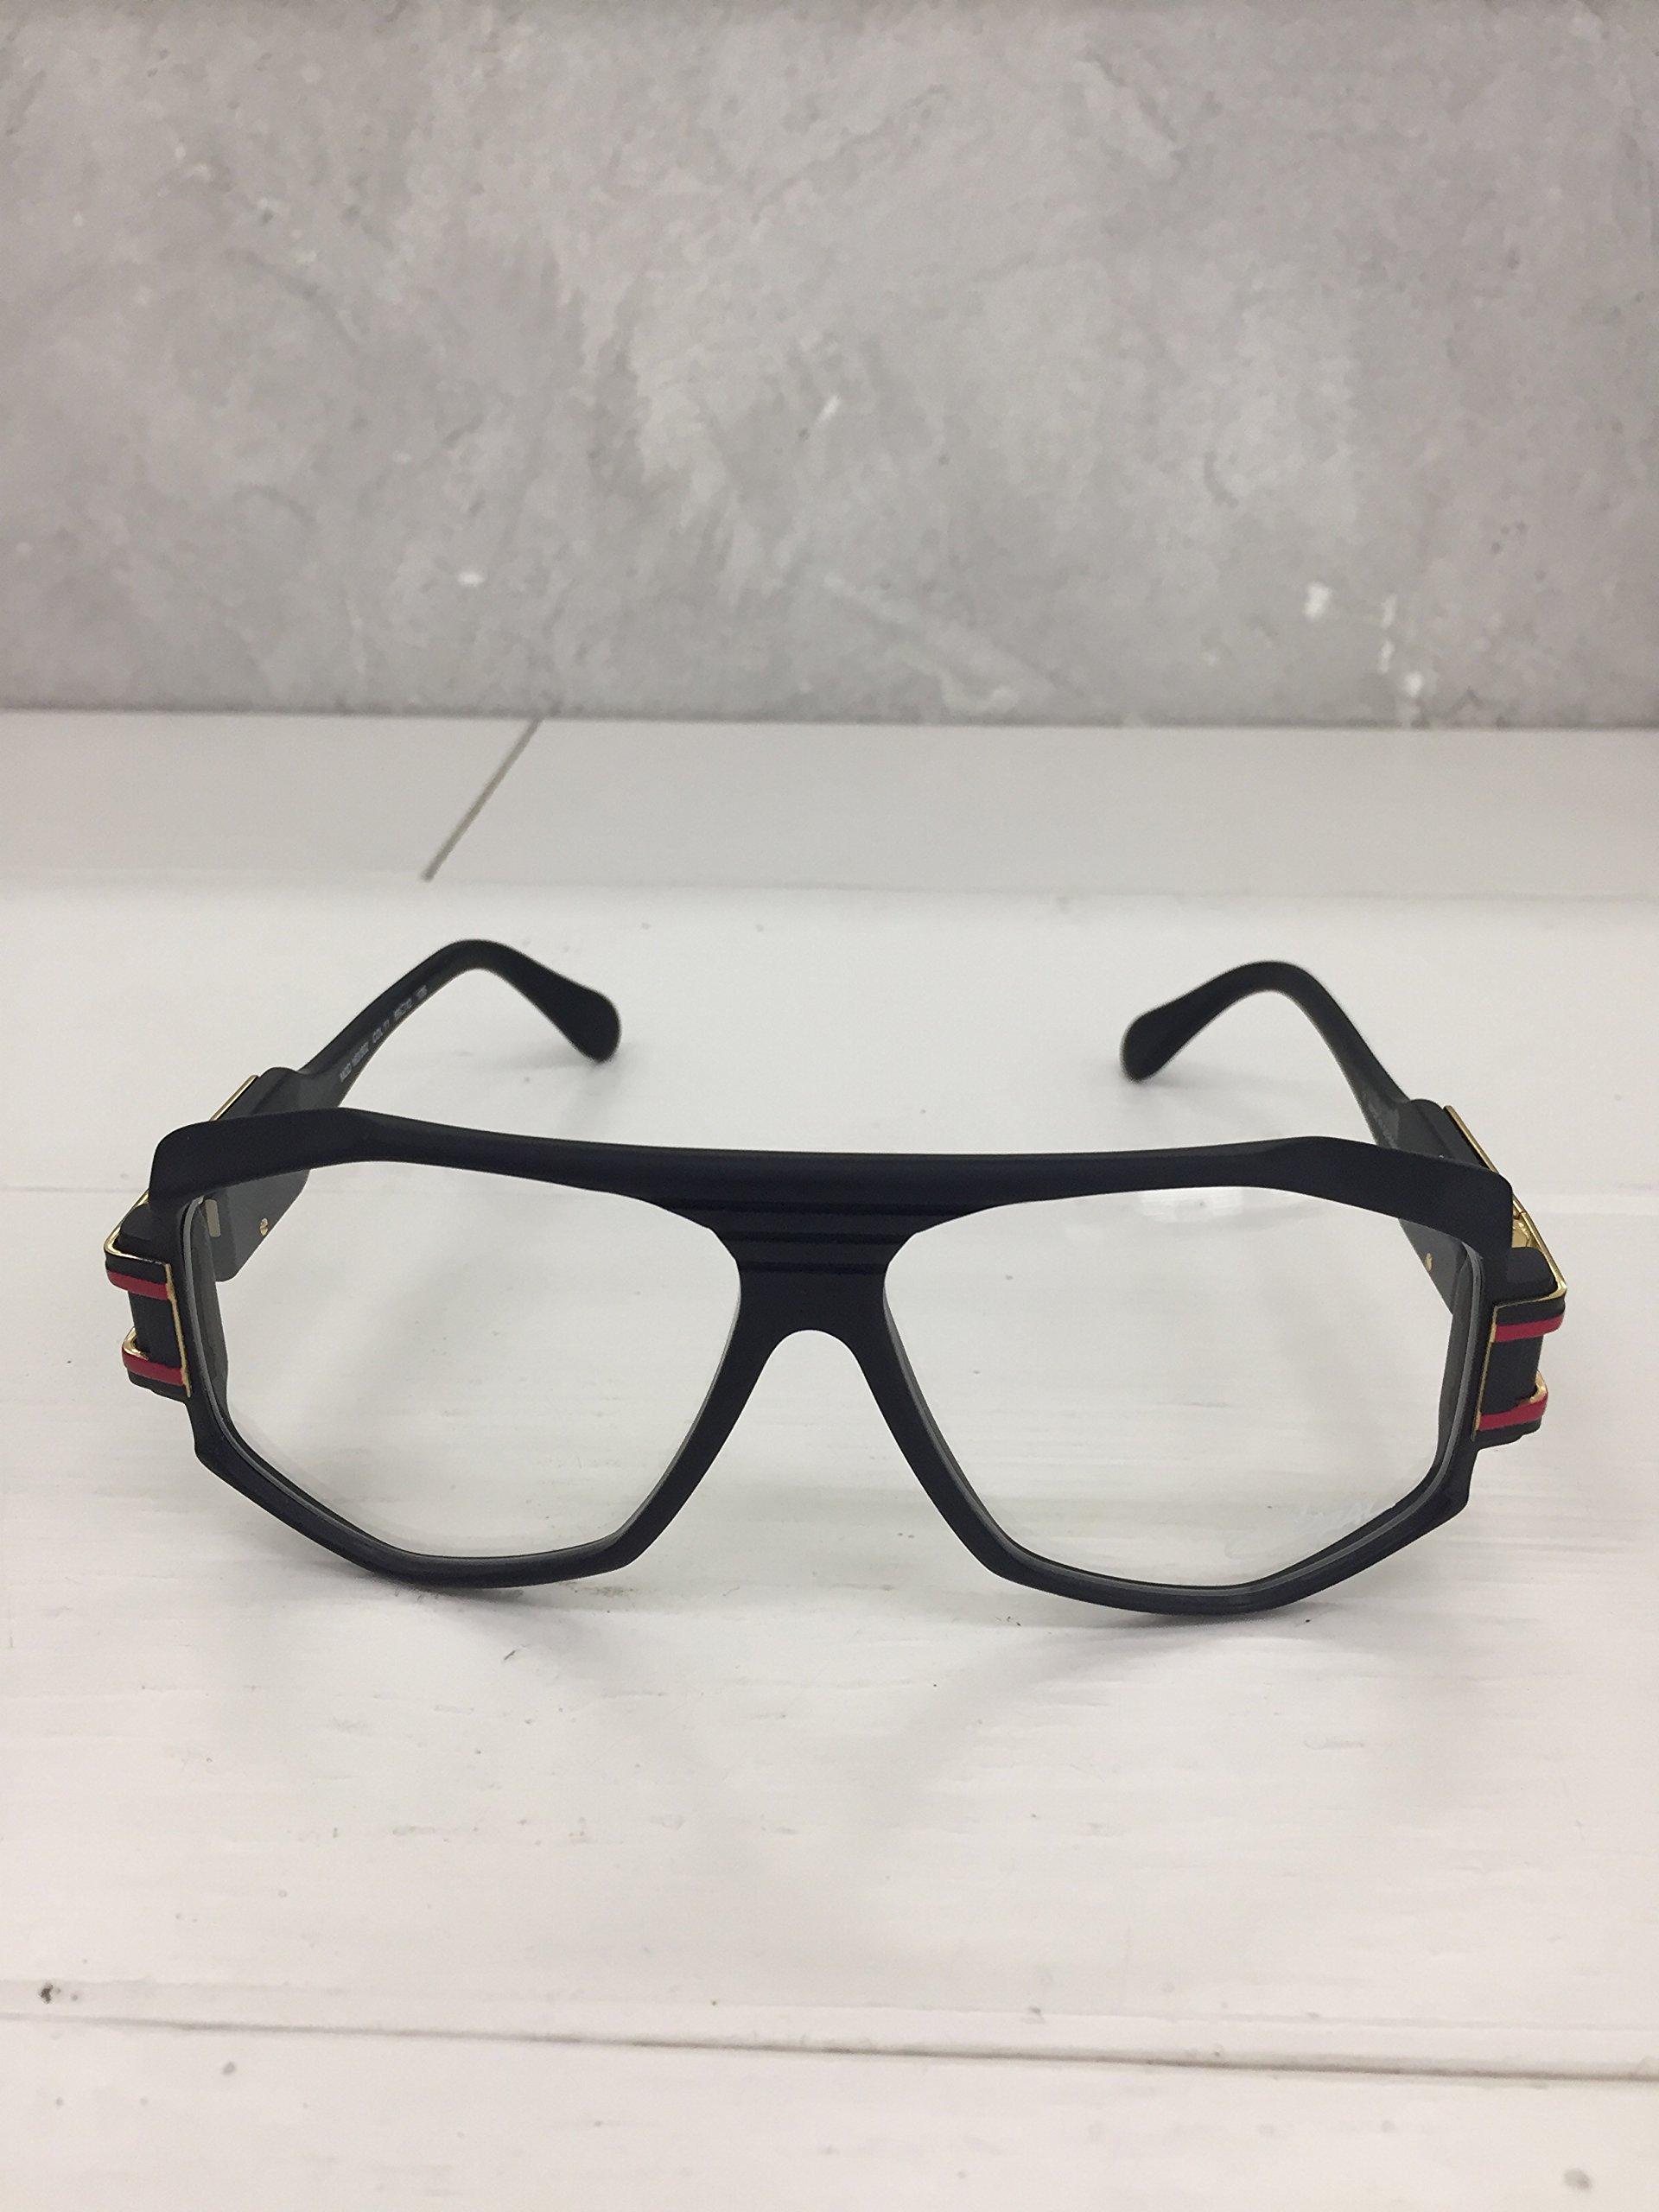 Eyewear Cazal Legends 163 11 matt black red 100% Authentic new